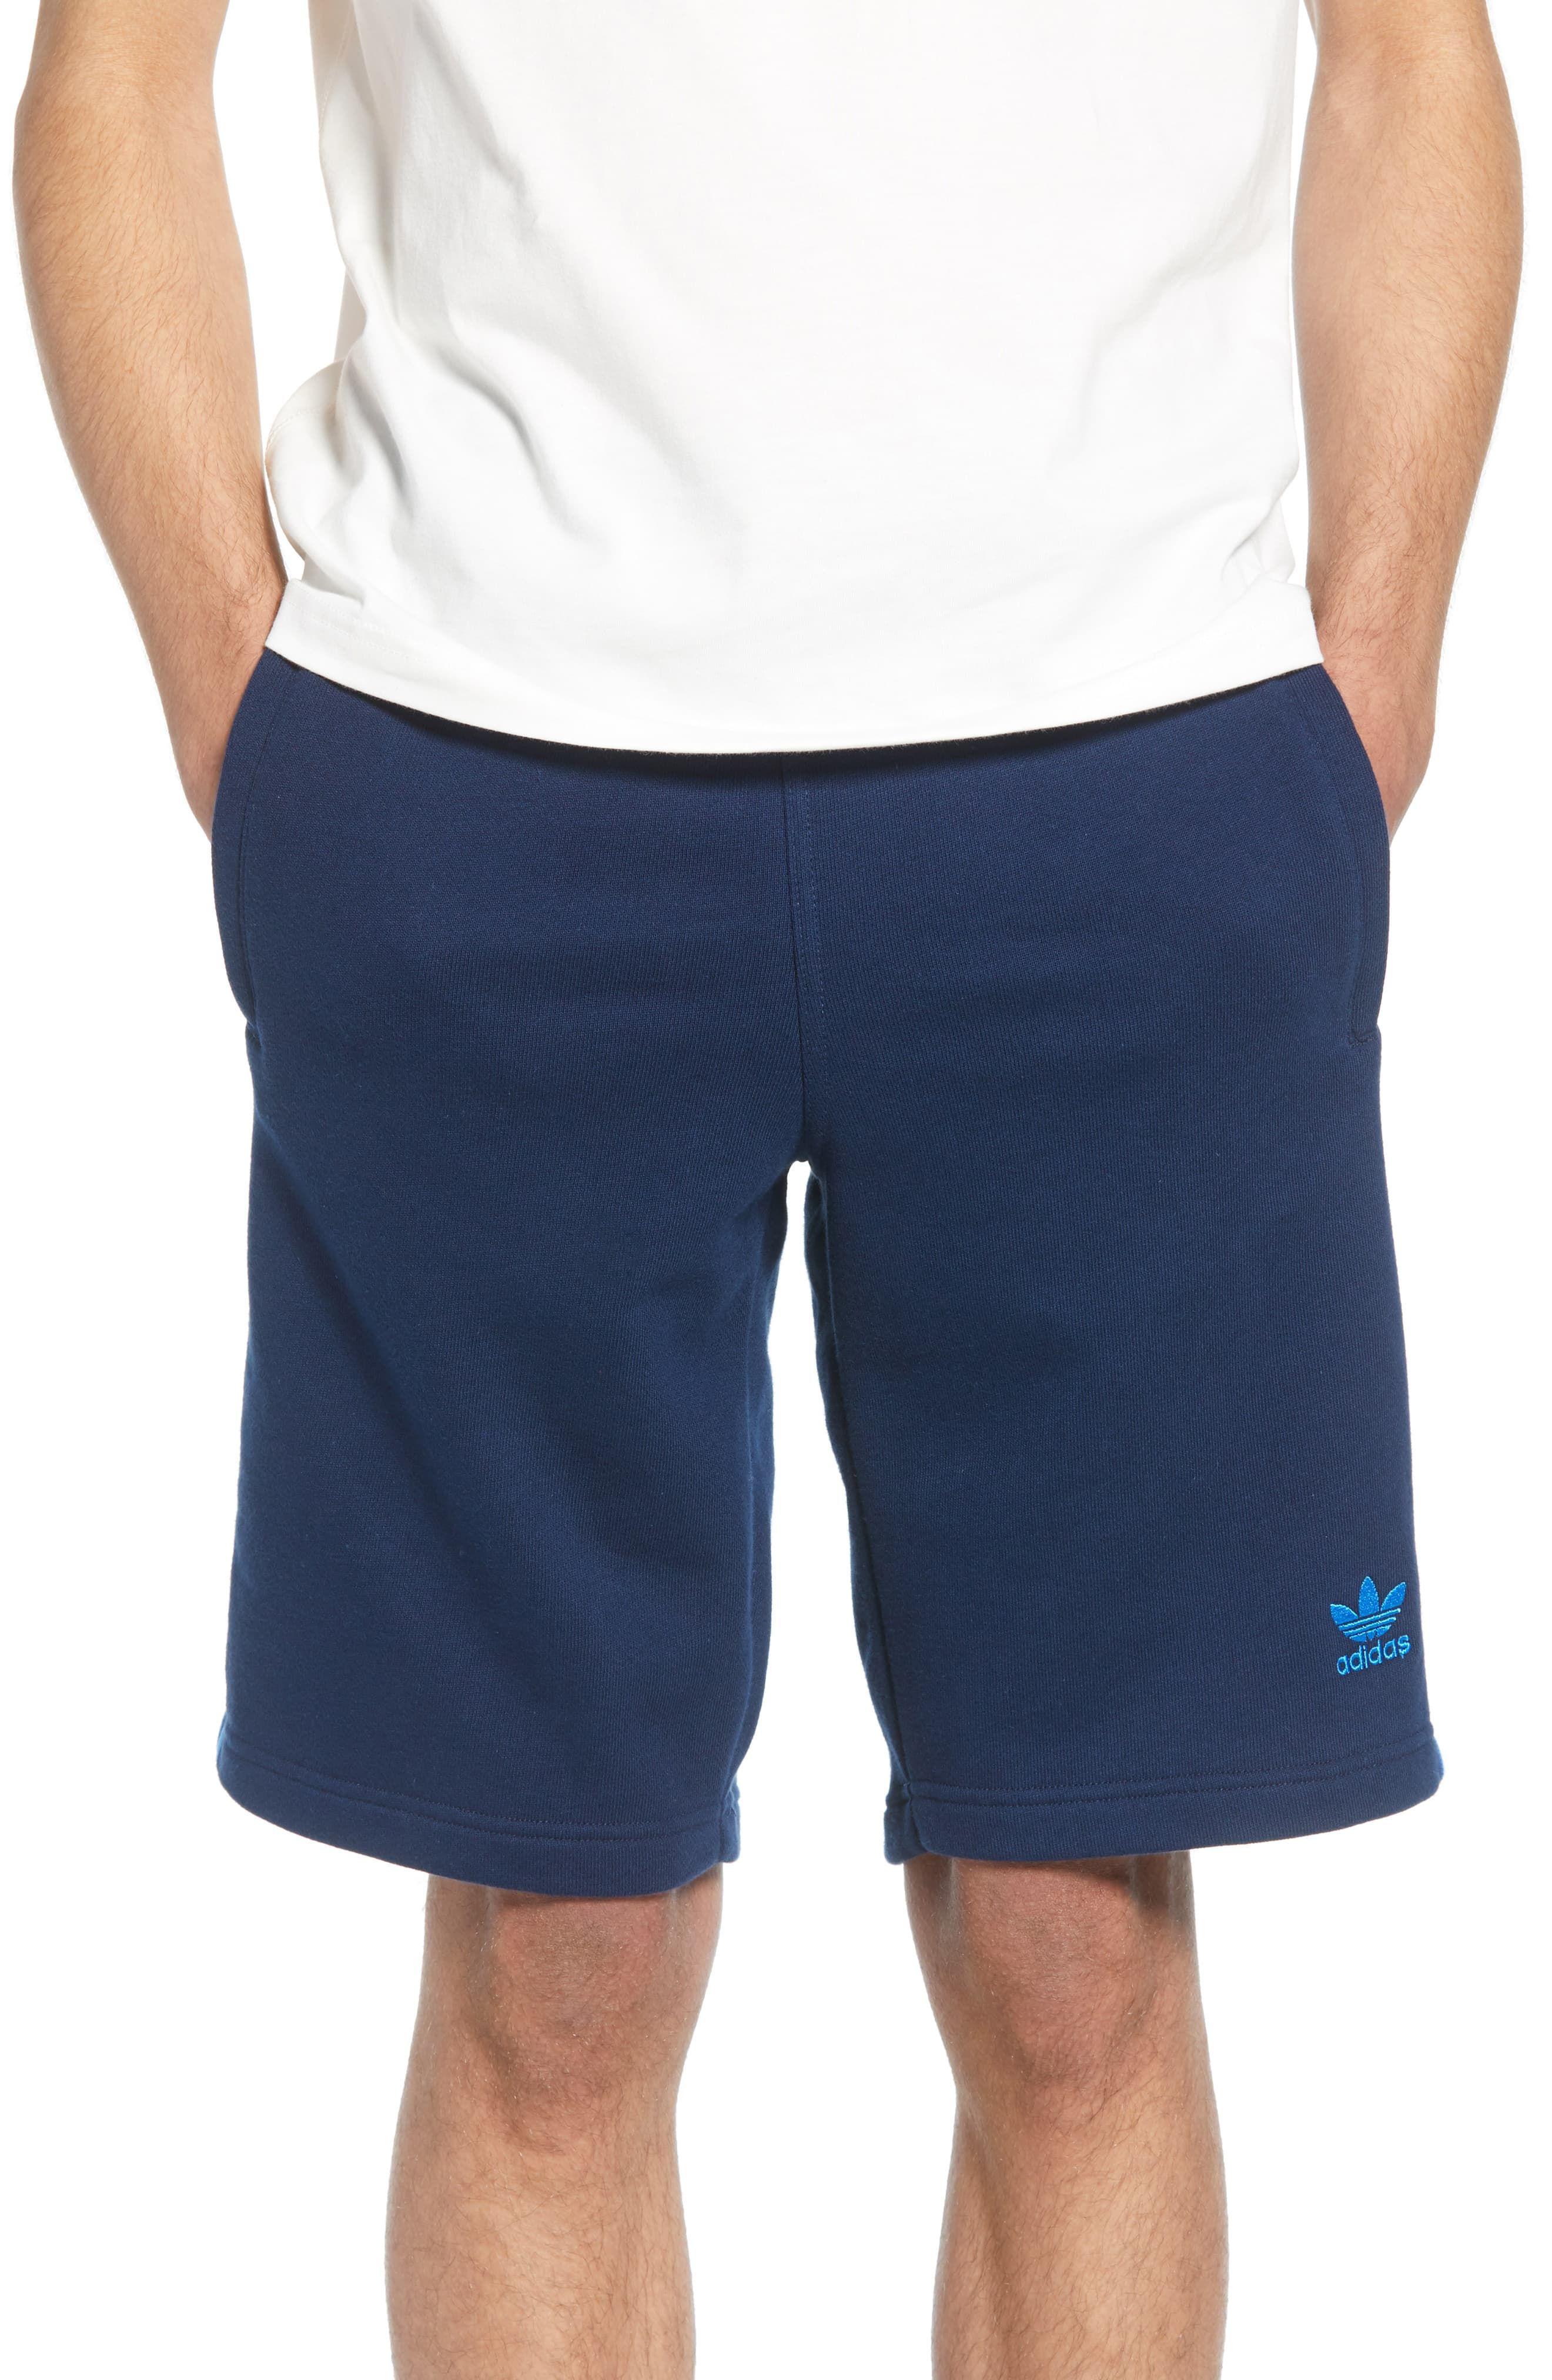 fa1a54aade939 Men's Adidas Originals 3-Stripes Athletic Shorts, Size Small - Blue ...